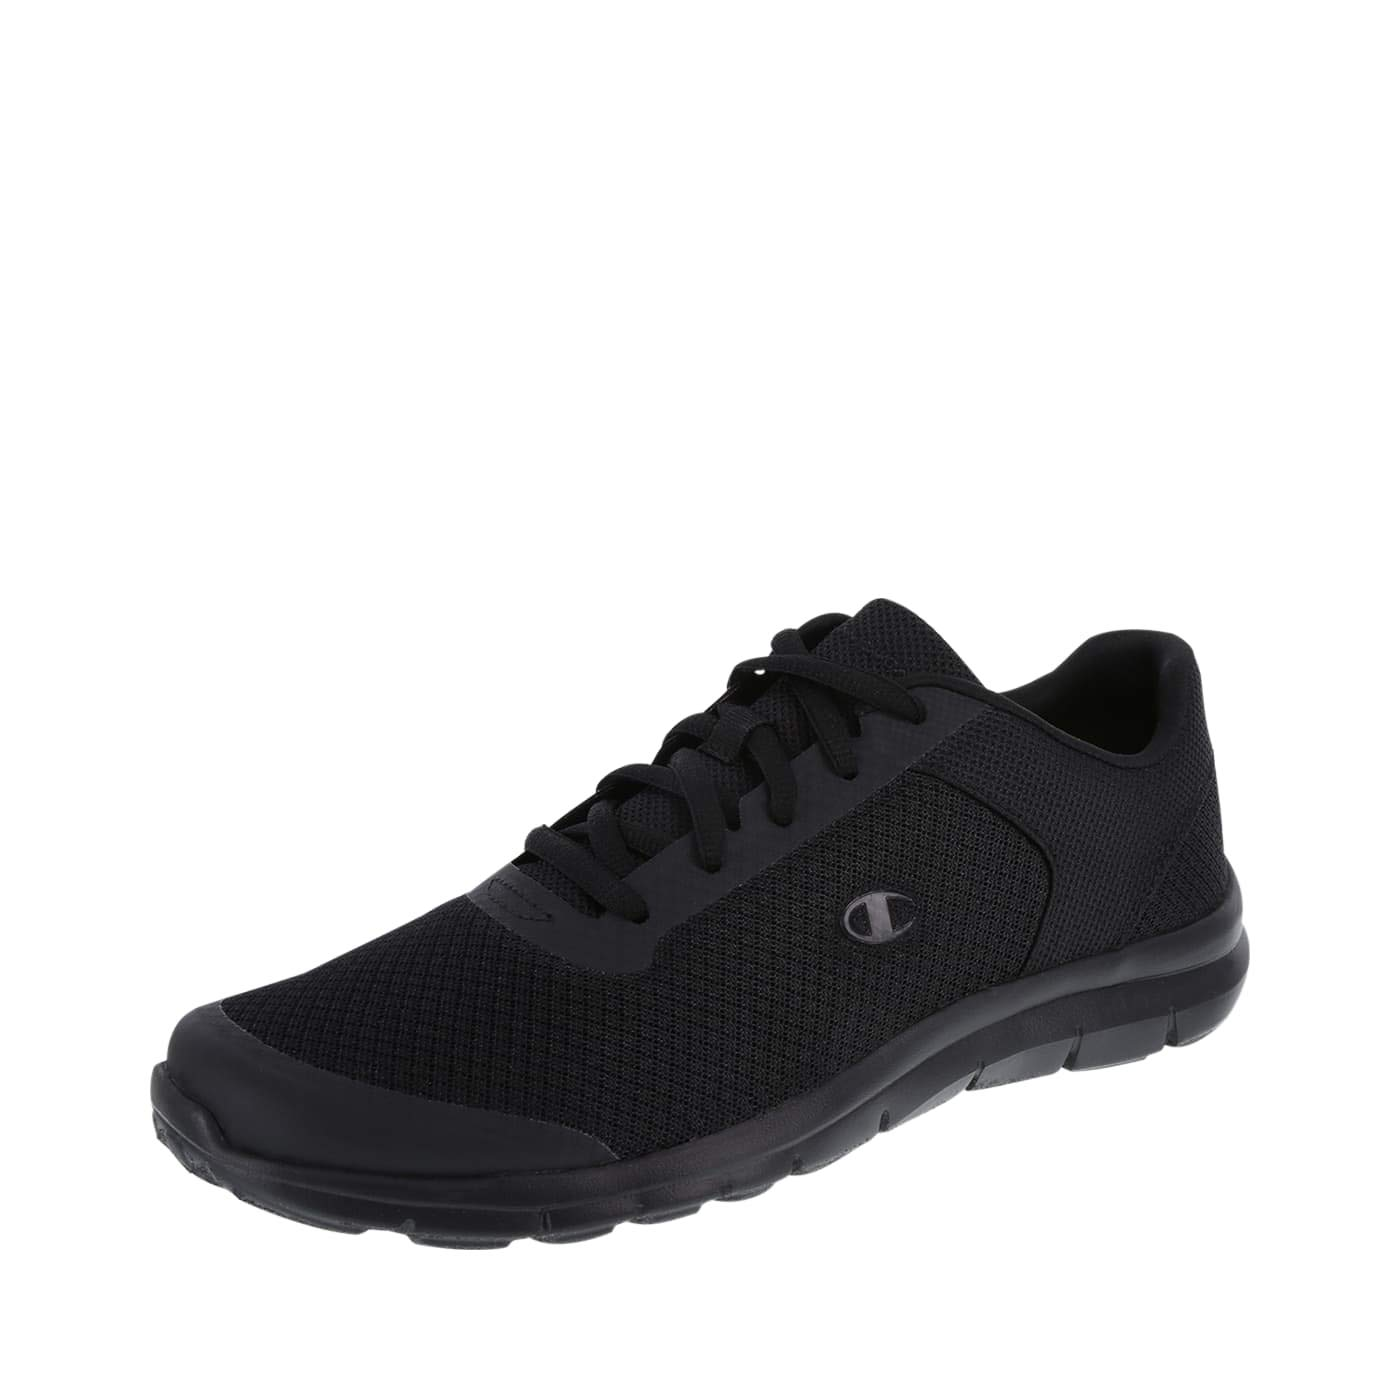 606a47bb274c Amazon.com  Champion Men s Gusto Cross Trainer  Shoes